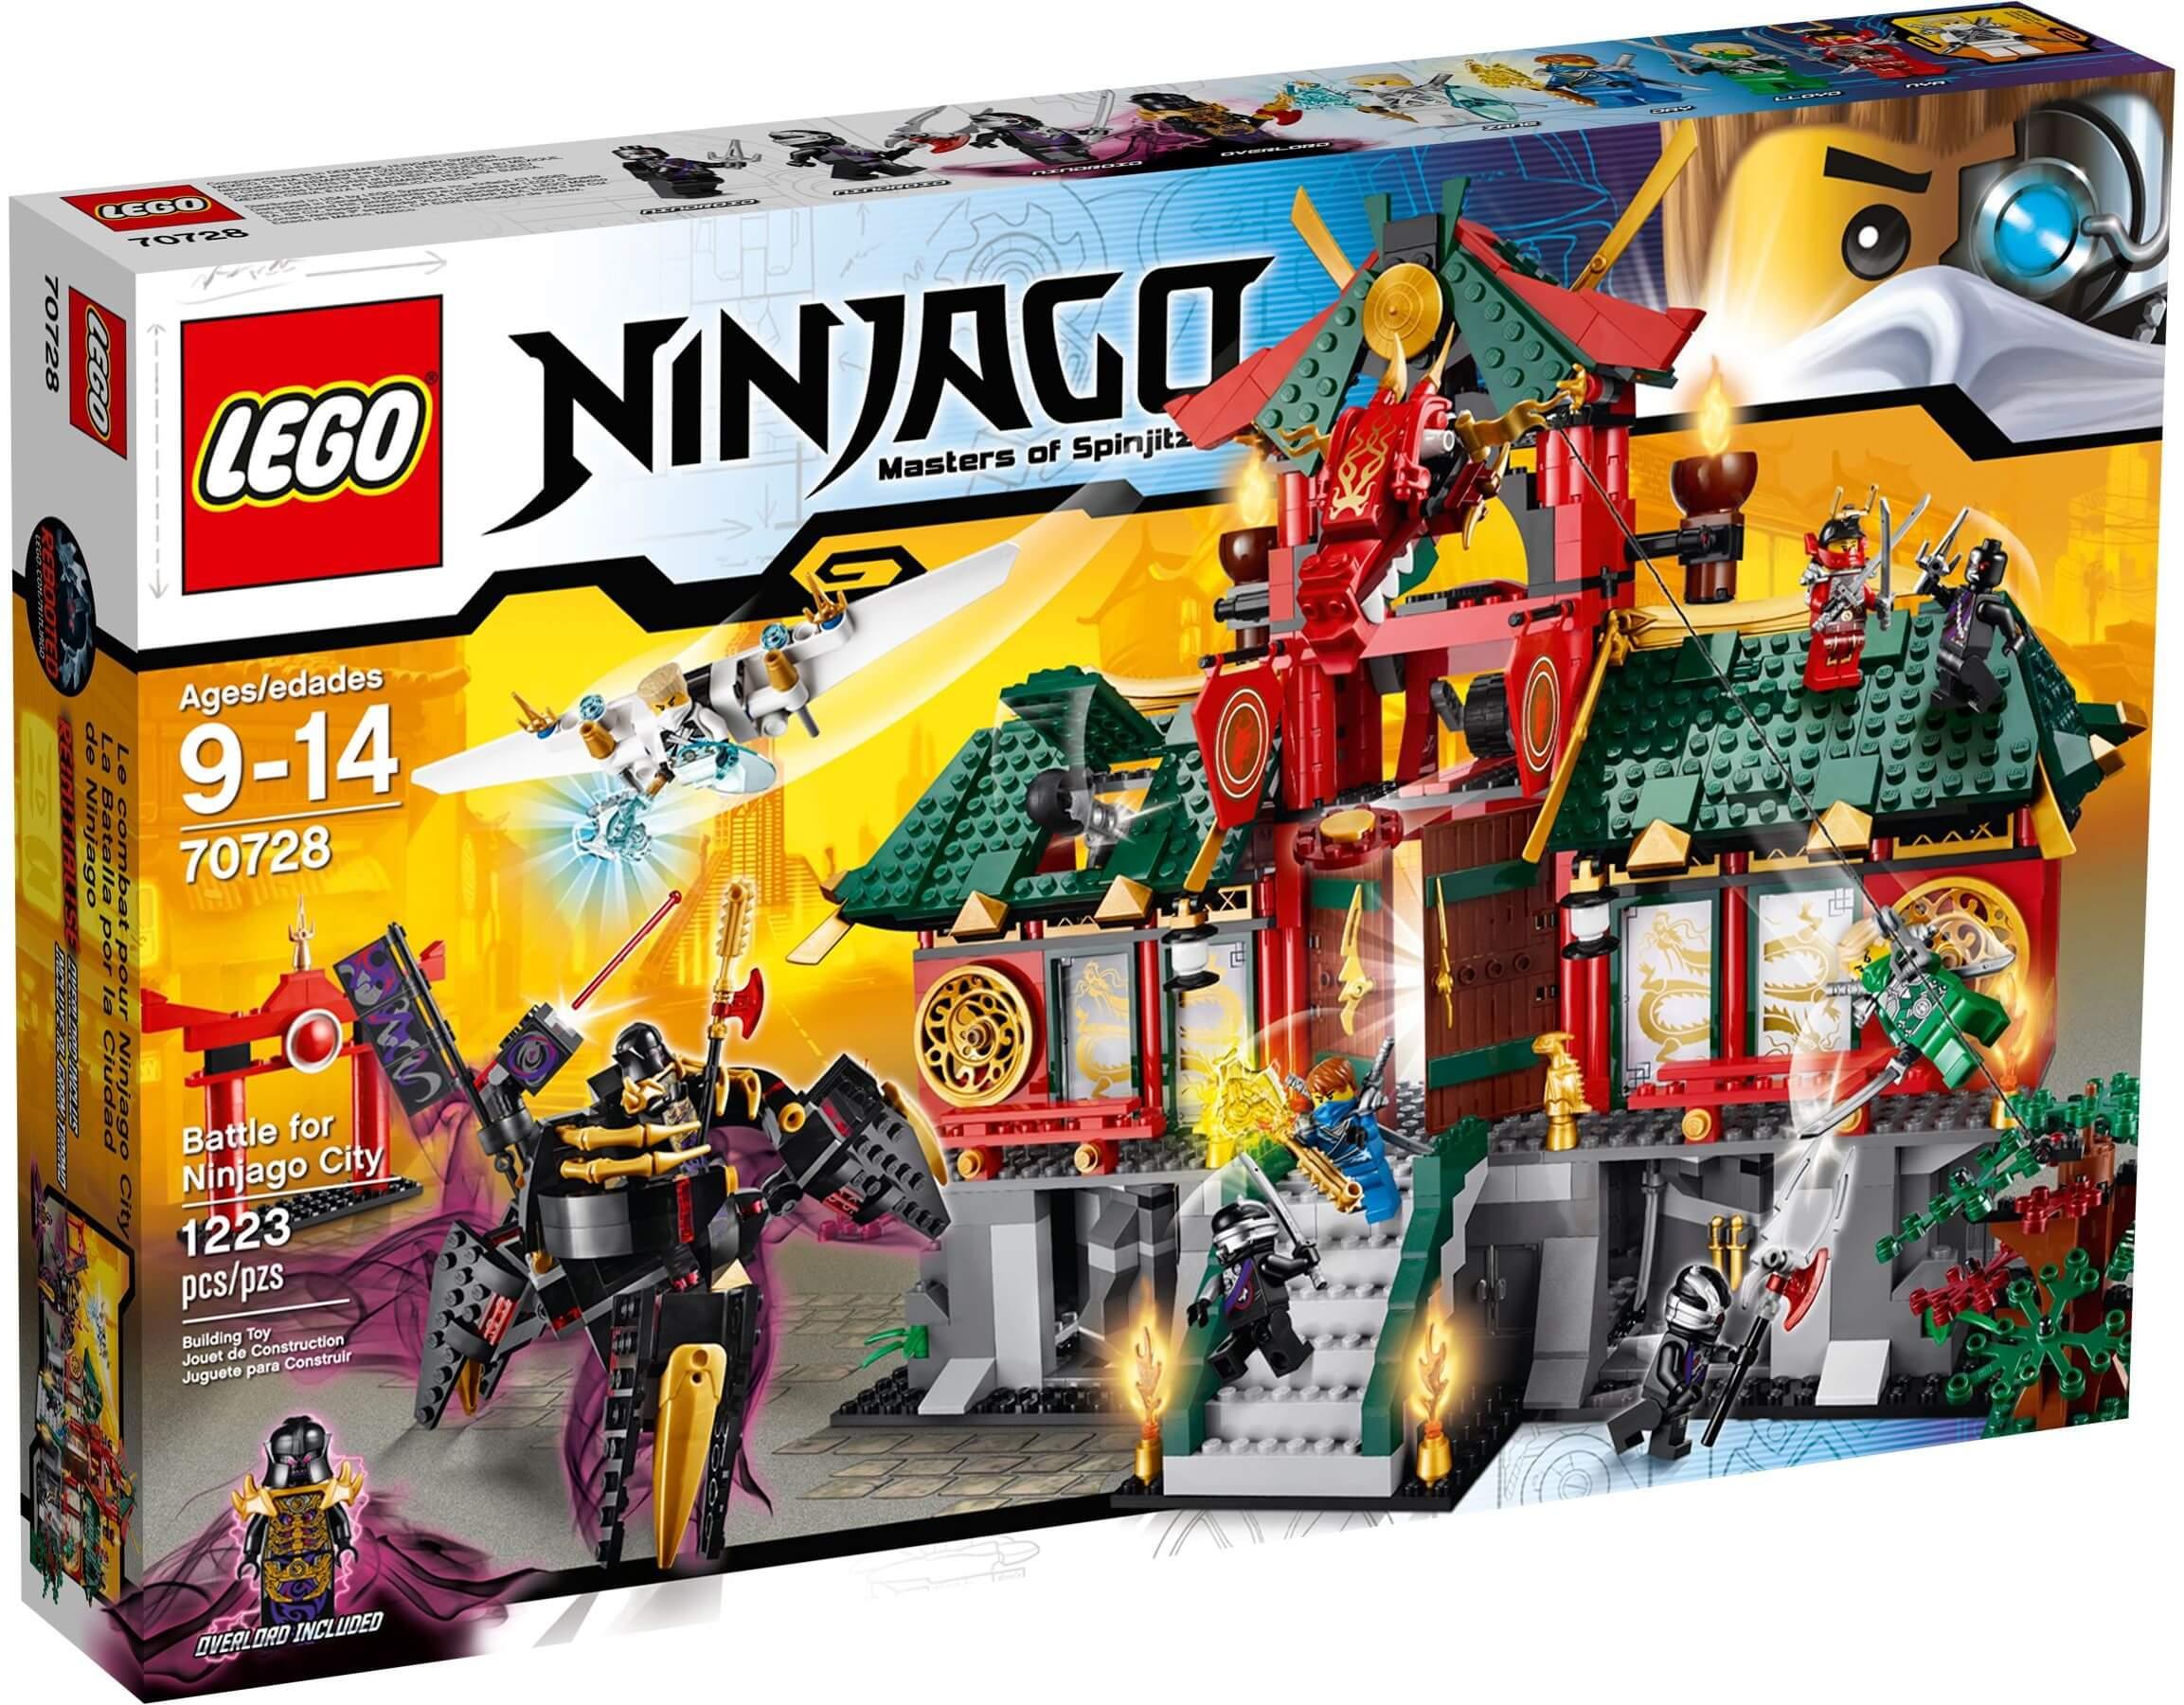 Mua đồ chơi LEGO 70728 - LEGO Ninjago 70728 - Trận Quyết chiến cho Thành phố Ninjago (LEGO Ninjago Battle for Ninjago City 70728)